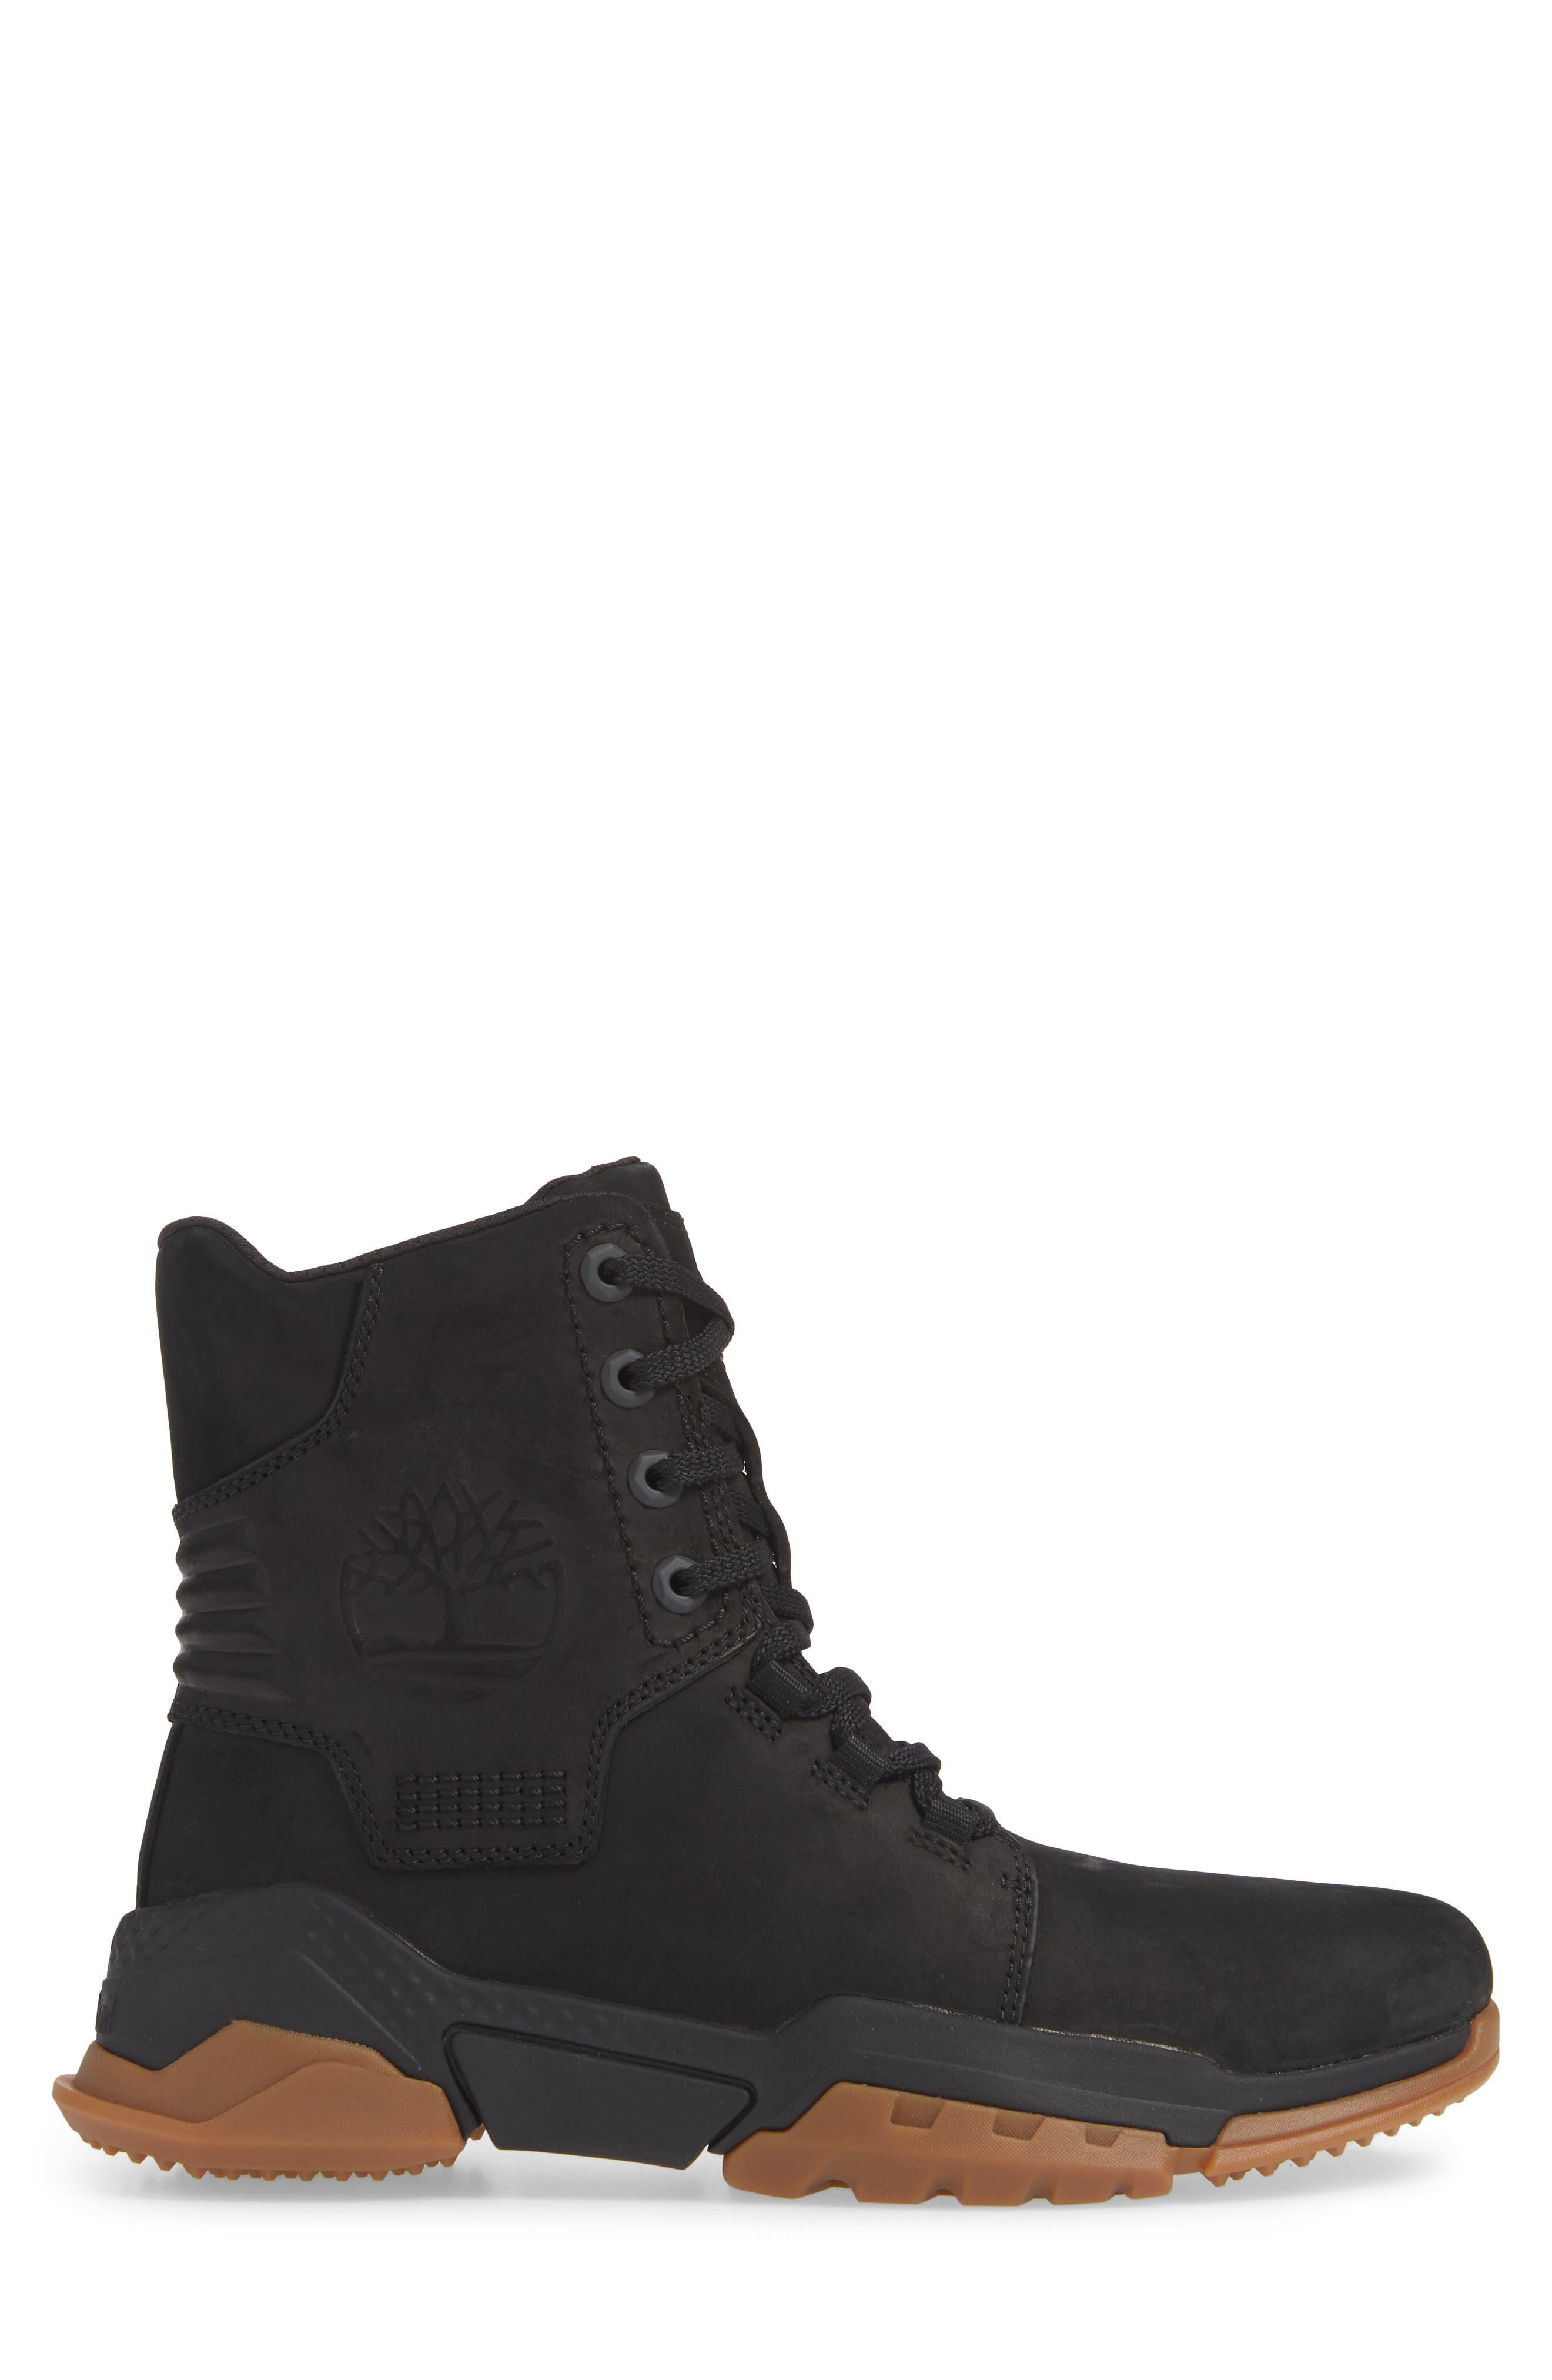 City Force Reveal Plain Toe Boot,                             Alternate thumbnail 3, color,                             BLACK LEATHER/ NEOPRENE